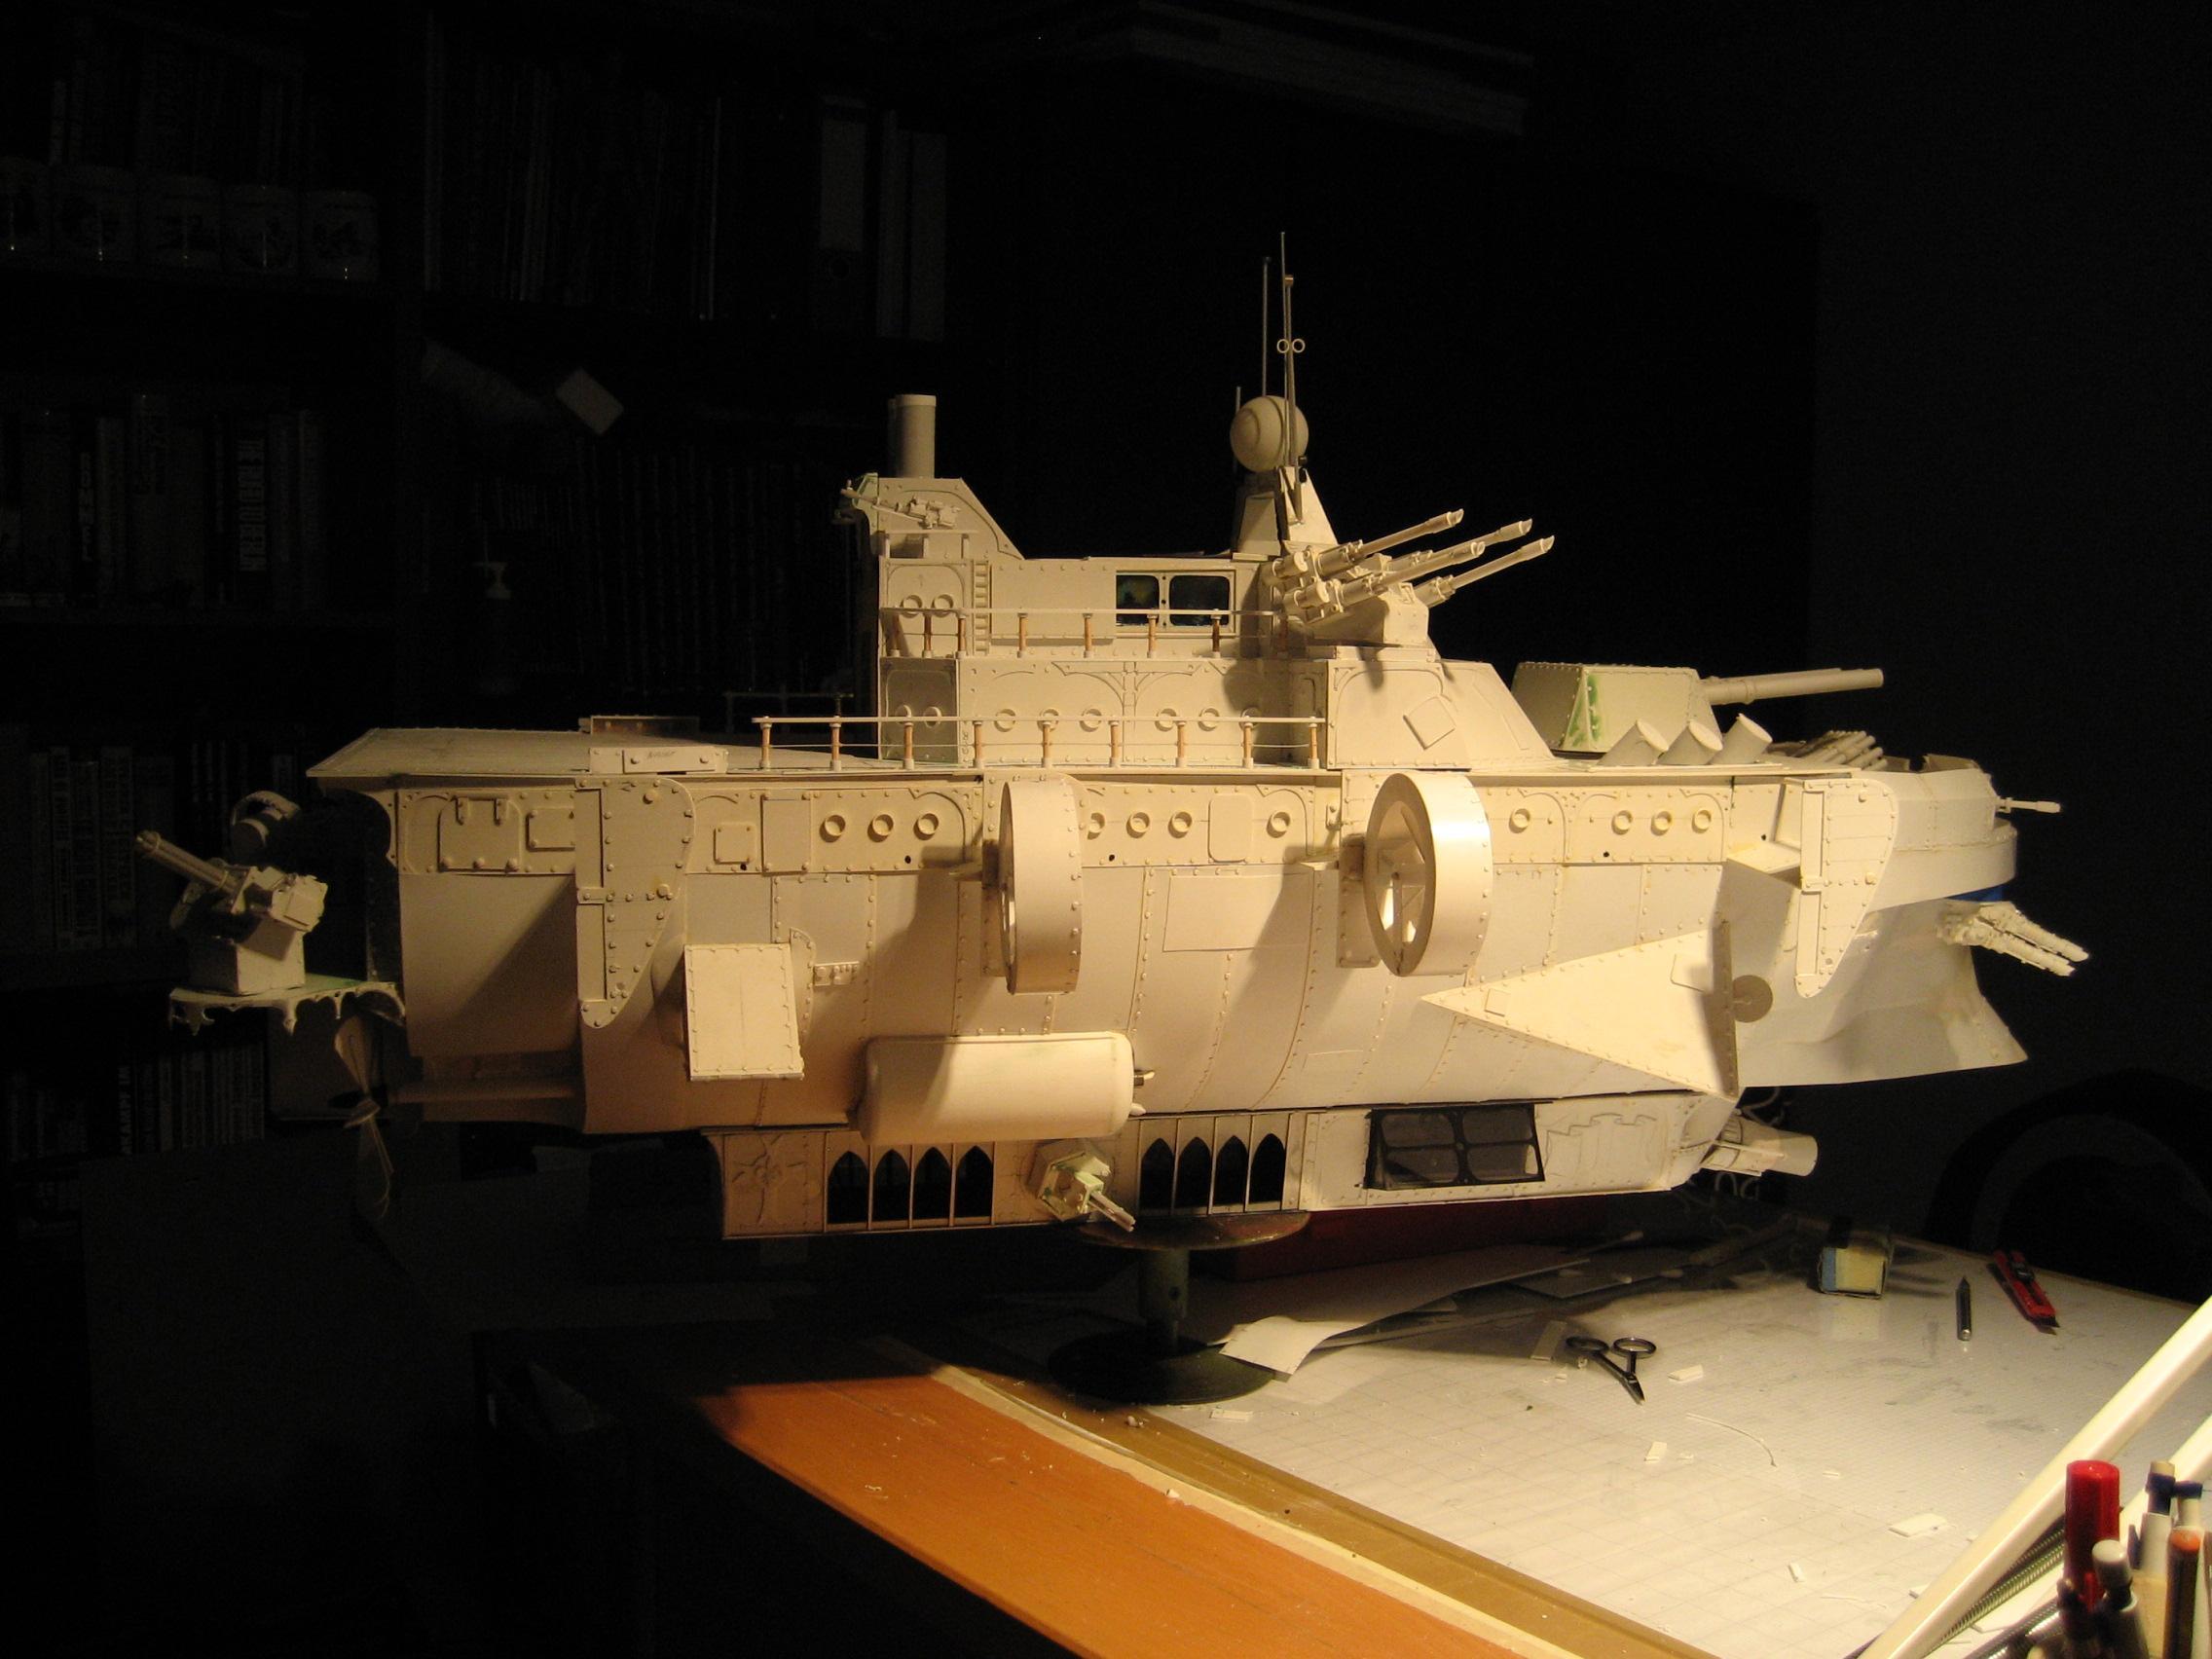 Airship, Scratch Build, Work In Progress